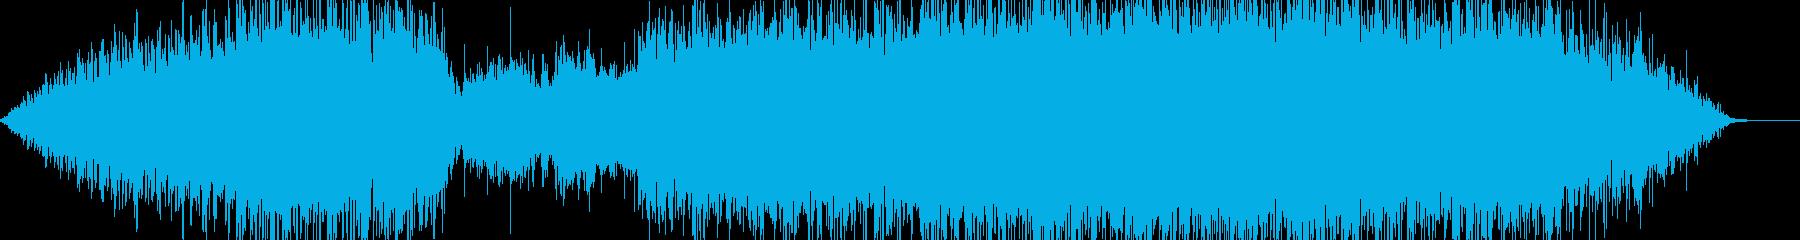 Synthetic motion2の再生済みの波形